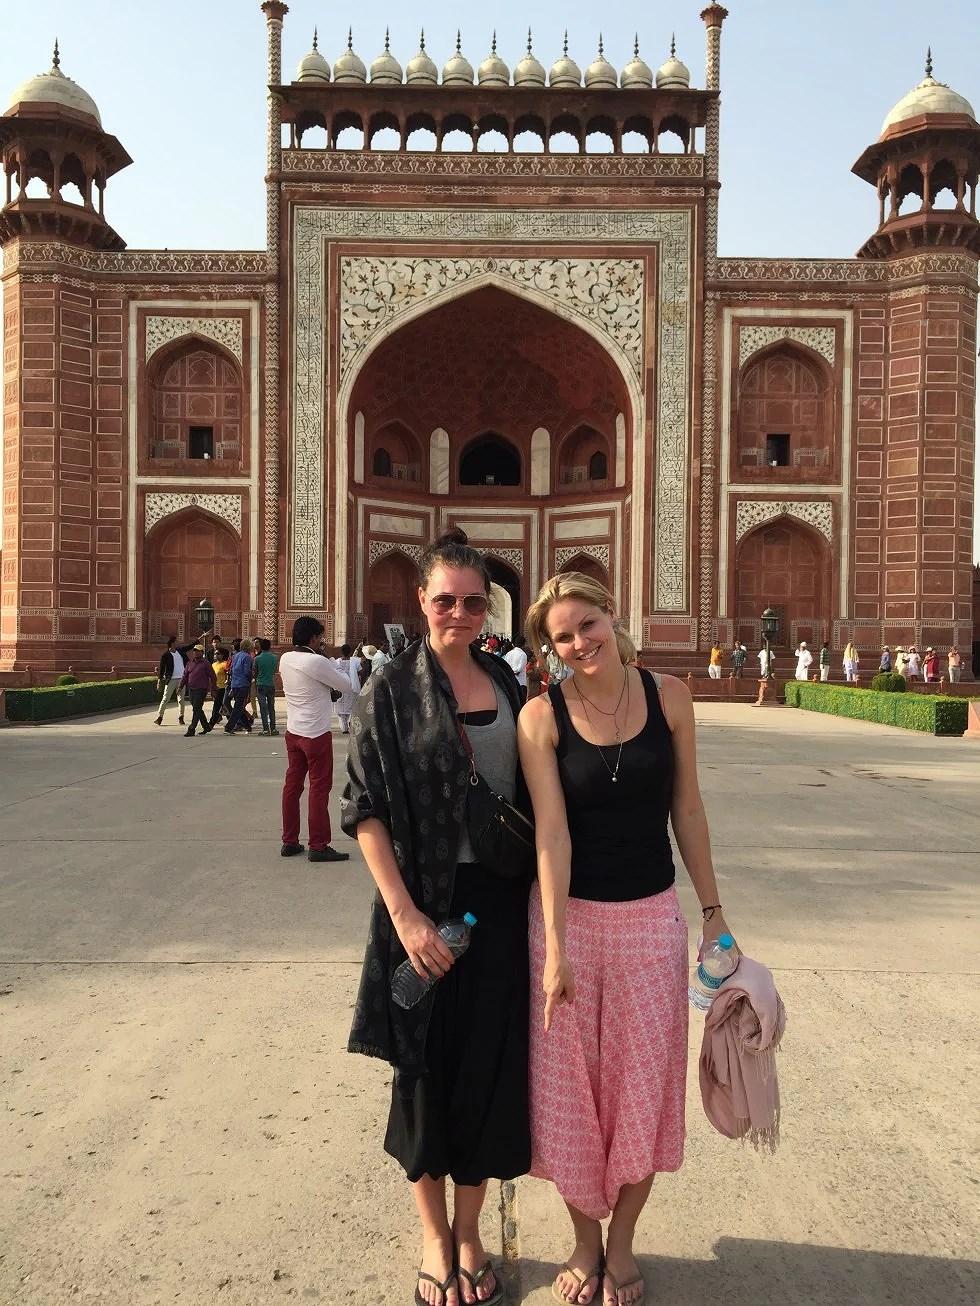 Maria og jeg står og peger ned, idet Taj Mahal er bygget symetrisk. Tager du en kniv og skærer lige ned igennem, så får du to identiske stykker. Og vi står på midten.